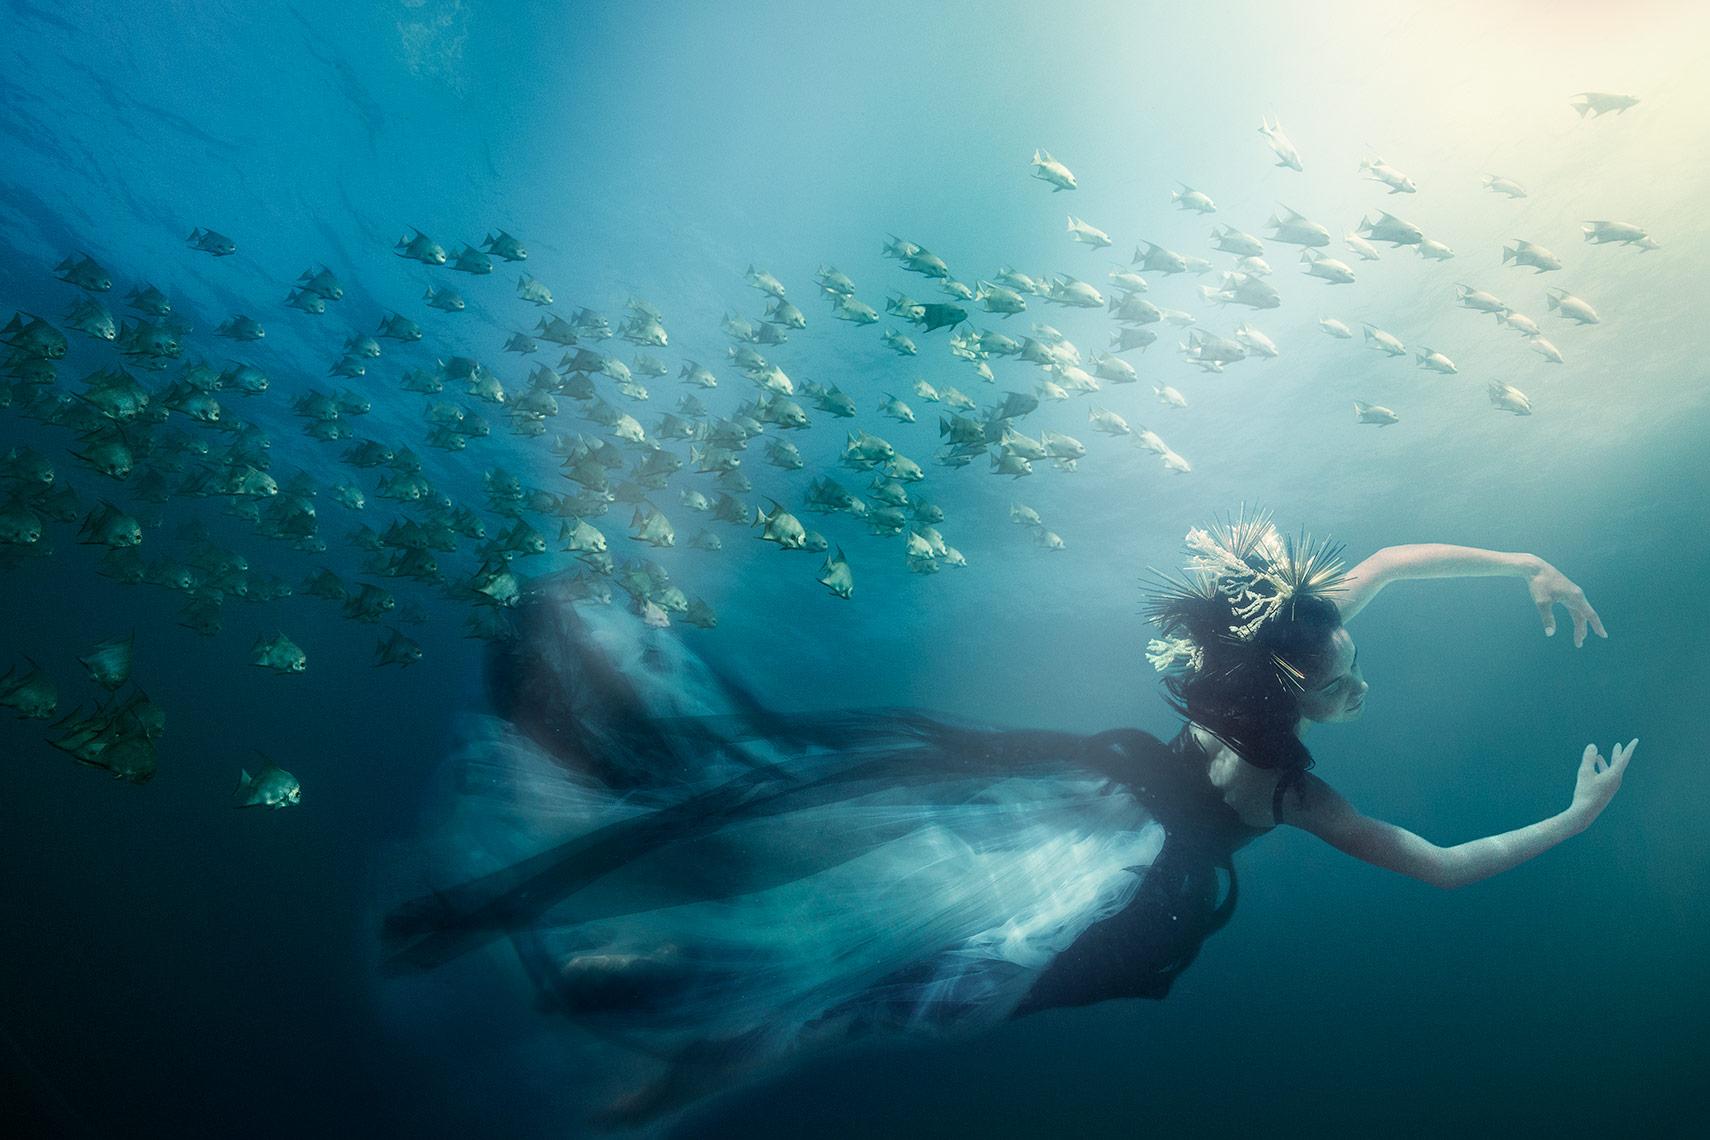 underwater.photography.jpg